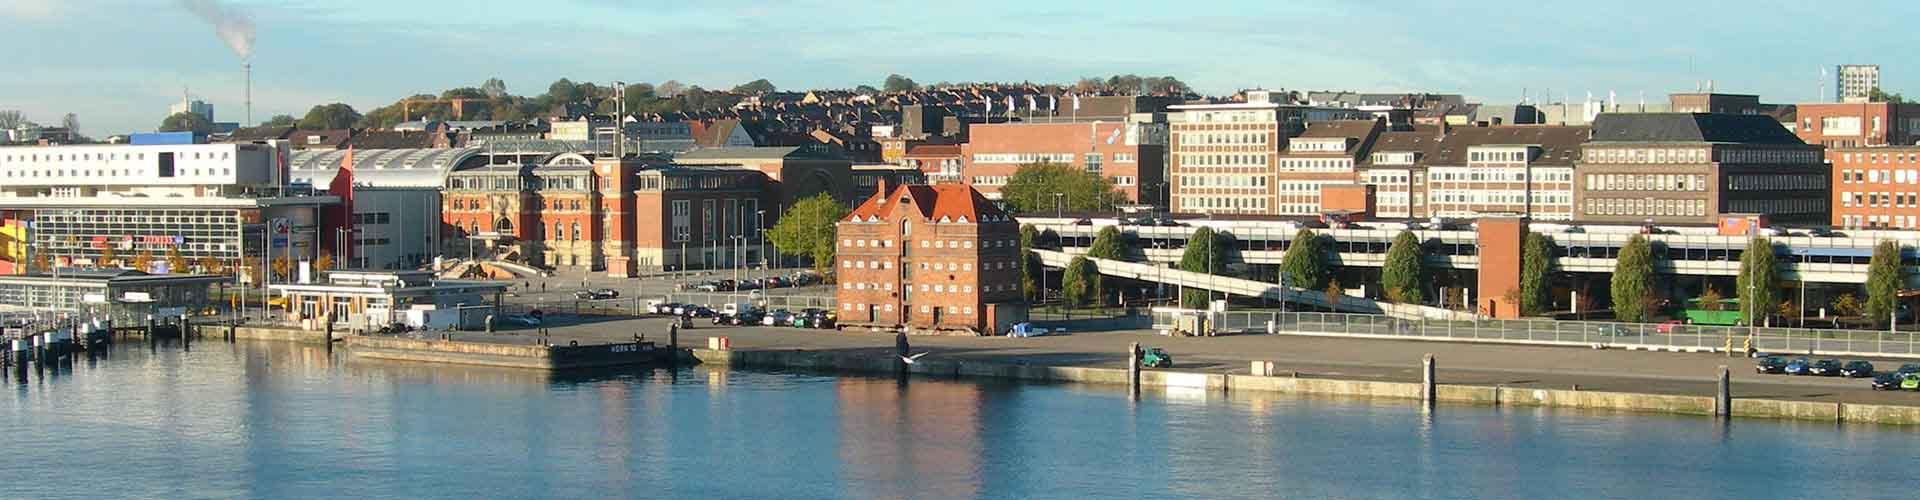 Kiel - Hostales en Kiel. Mapas de Kiel, Fotos y comentarios de cada Hostal en Kiel.